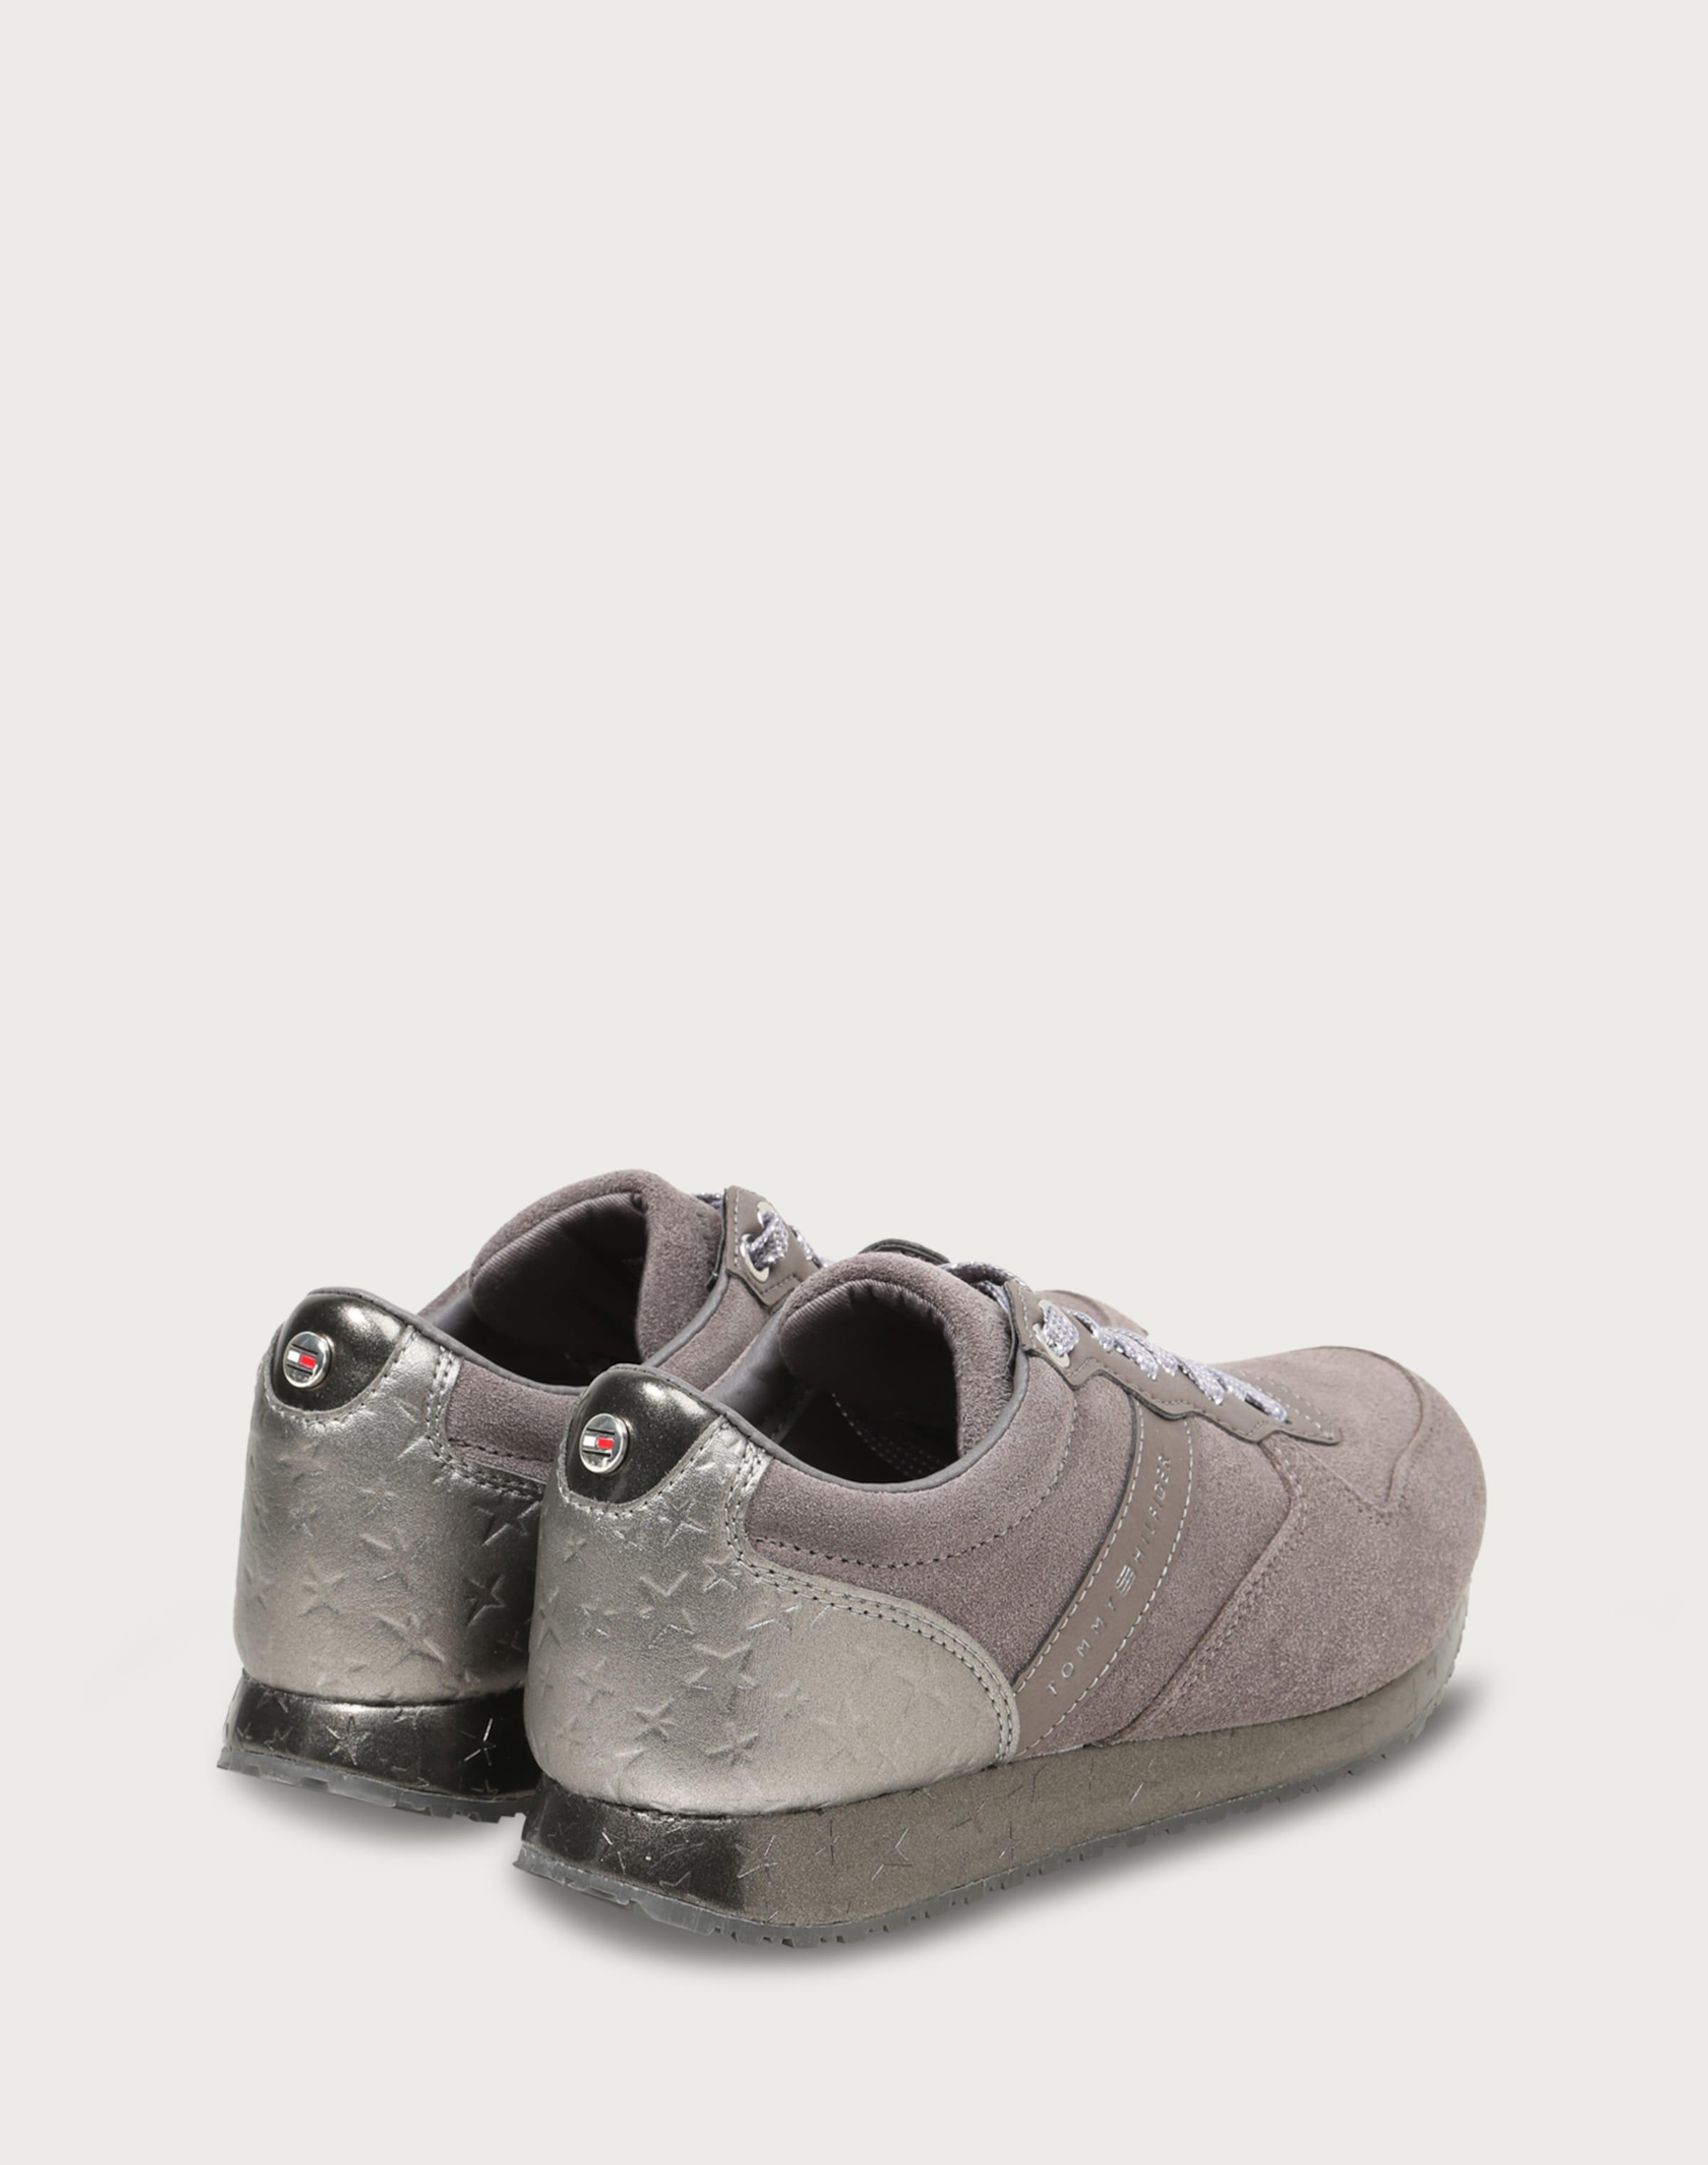 Beliebt Günstiger Preis TOMMY HILFIGER Sneaker 'S1285EVILLA 2C1' Rabatt Bester Großhandel Blättern Günstigen Preis qdBOc